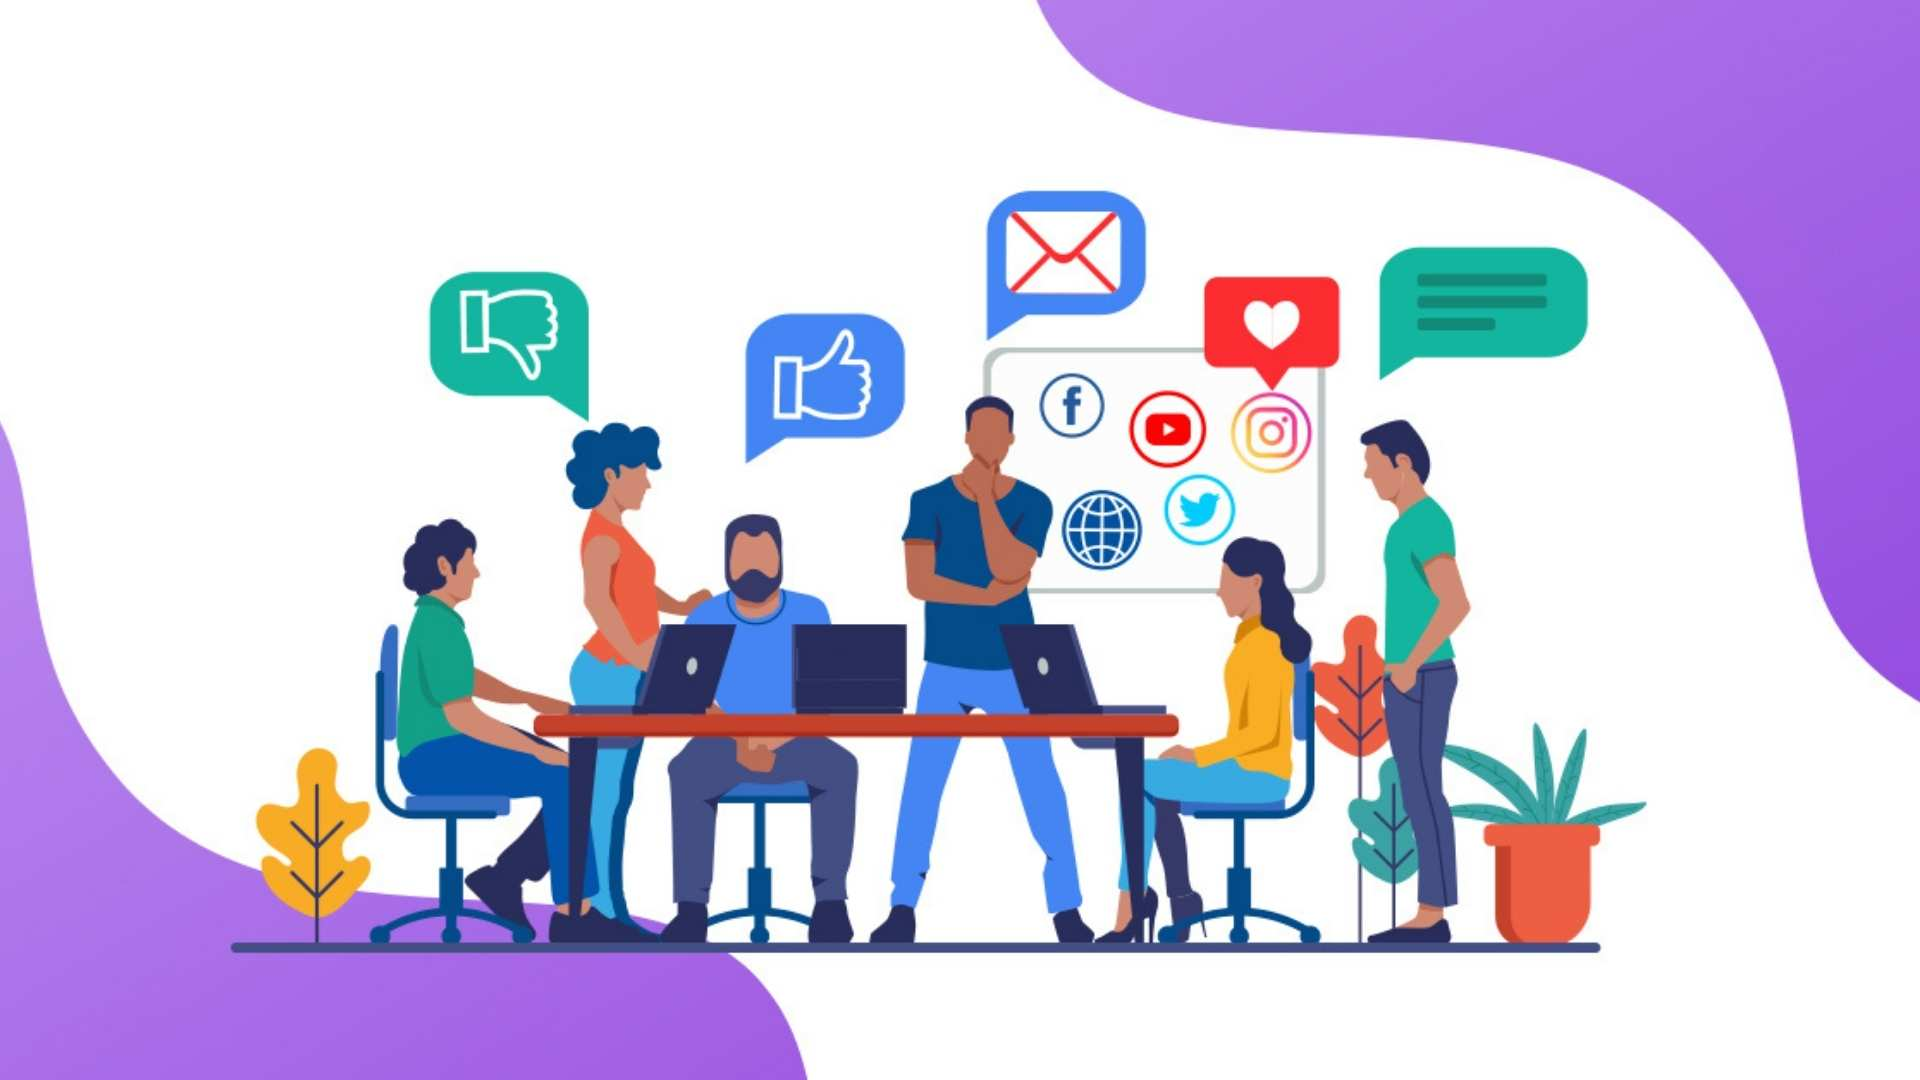 Team work on digital brand presence